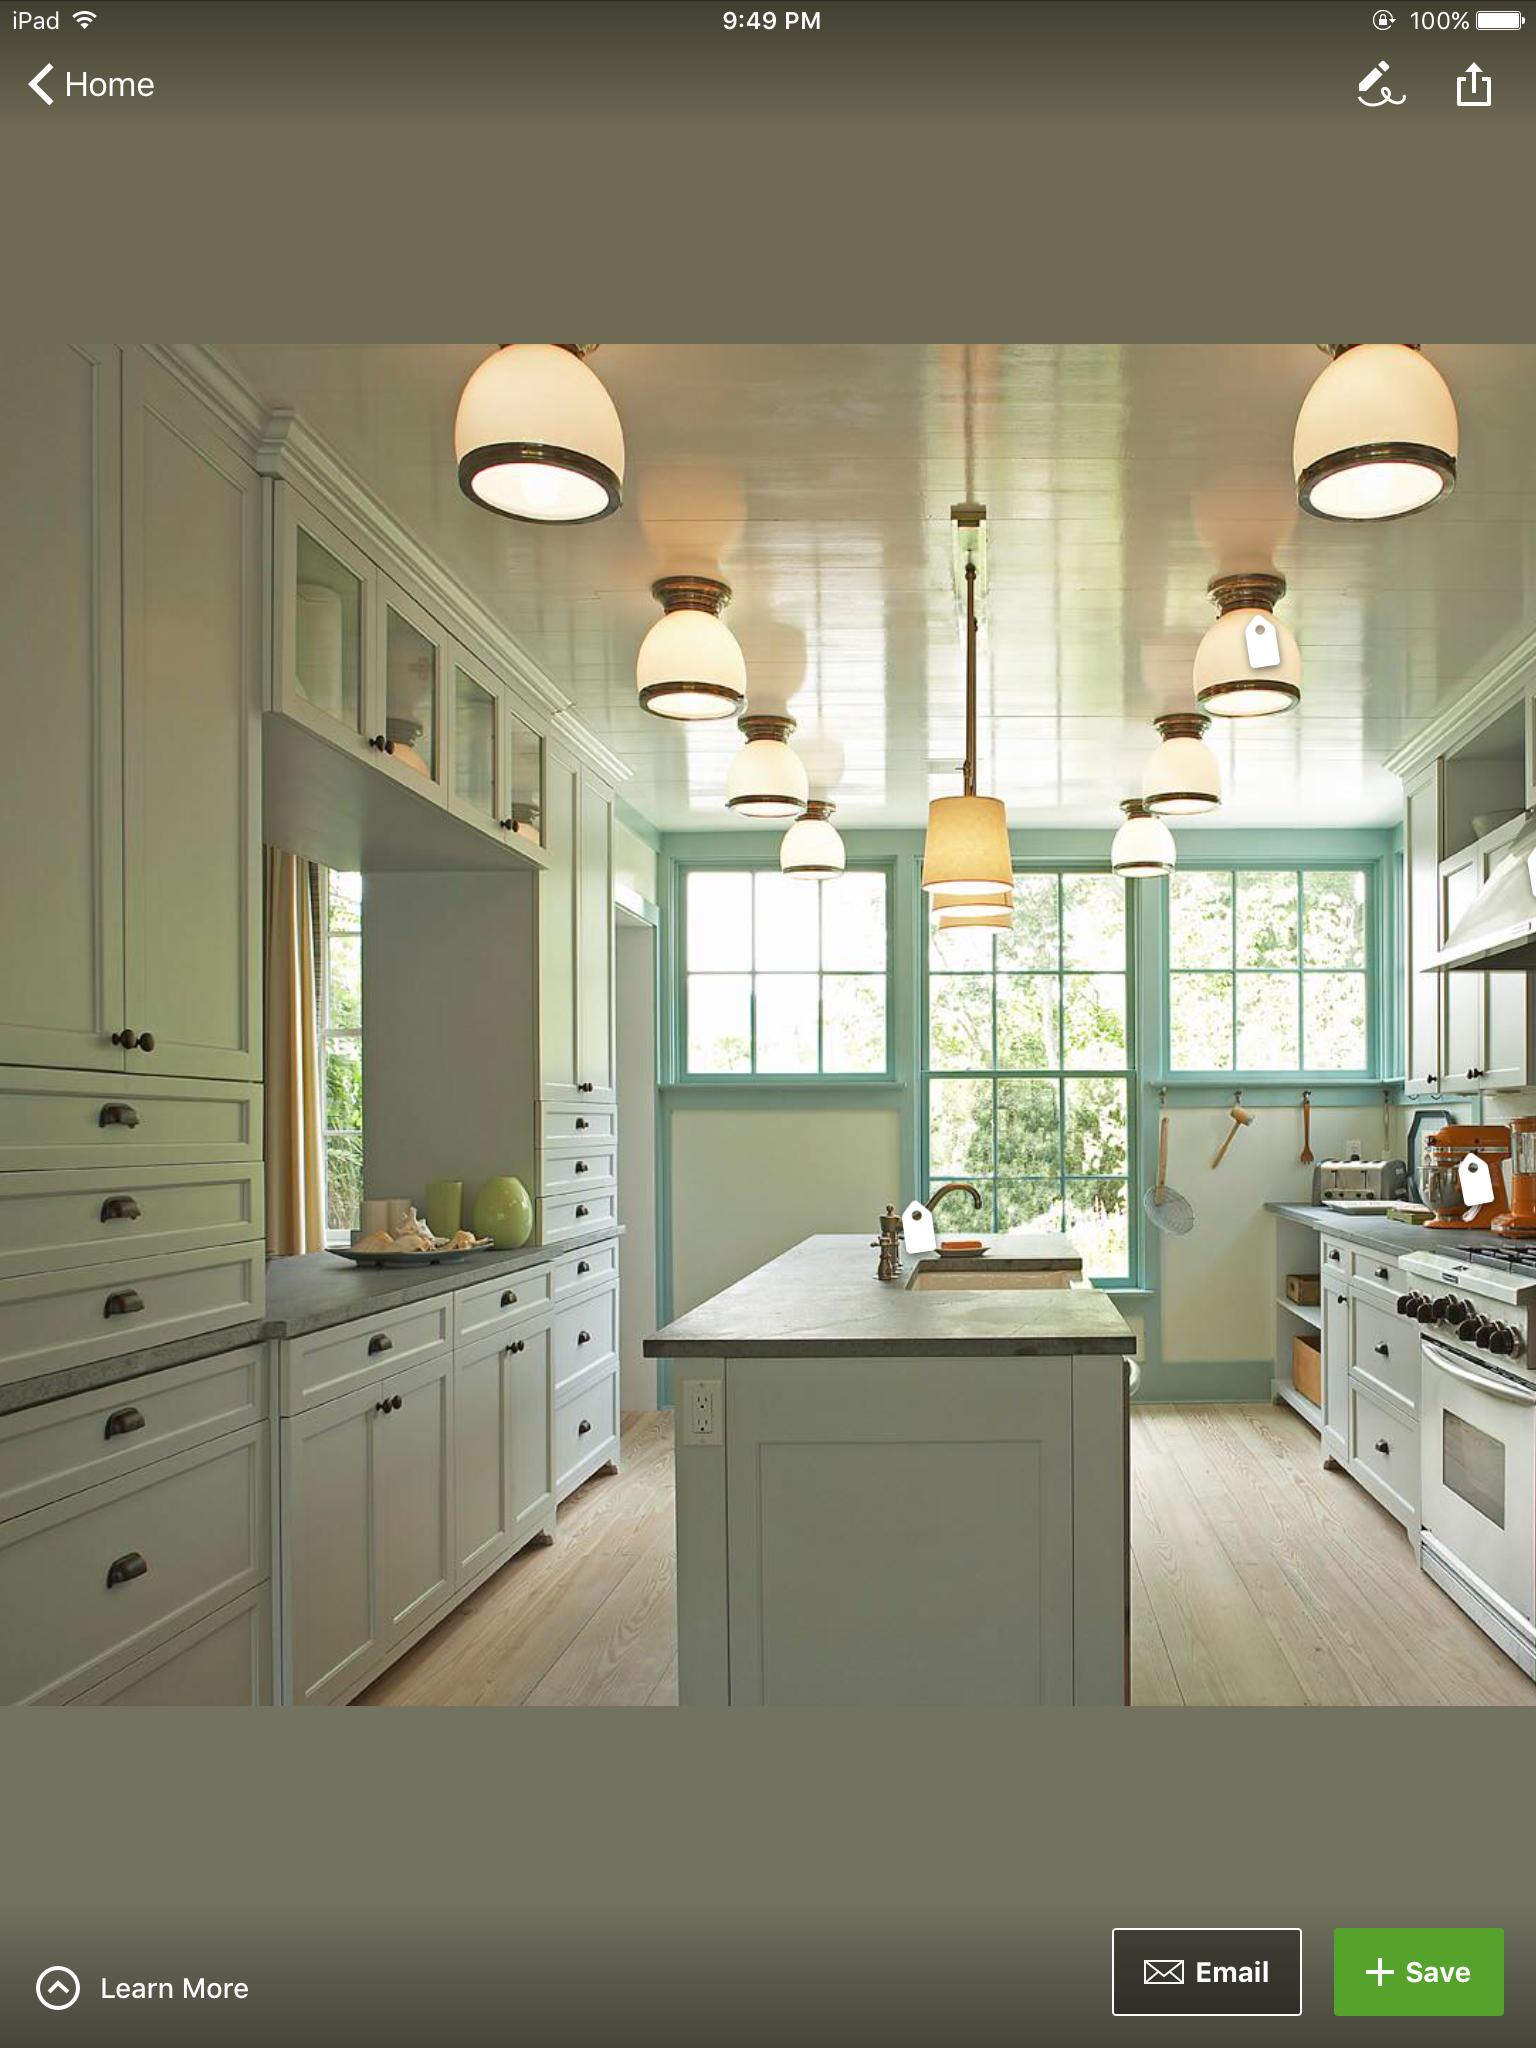 Pin by Cindi Smith Elick on Kitchen   Kitchen inspirations ...